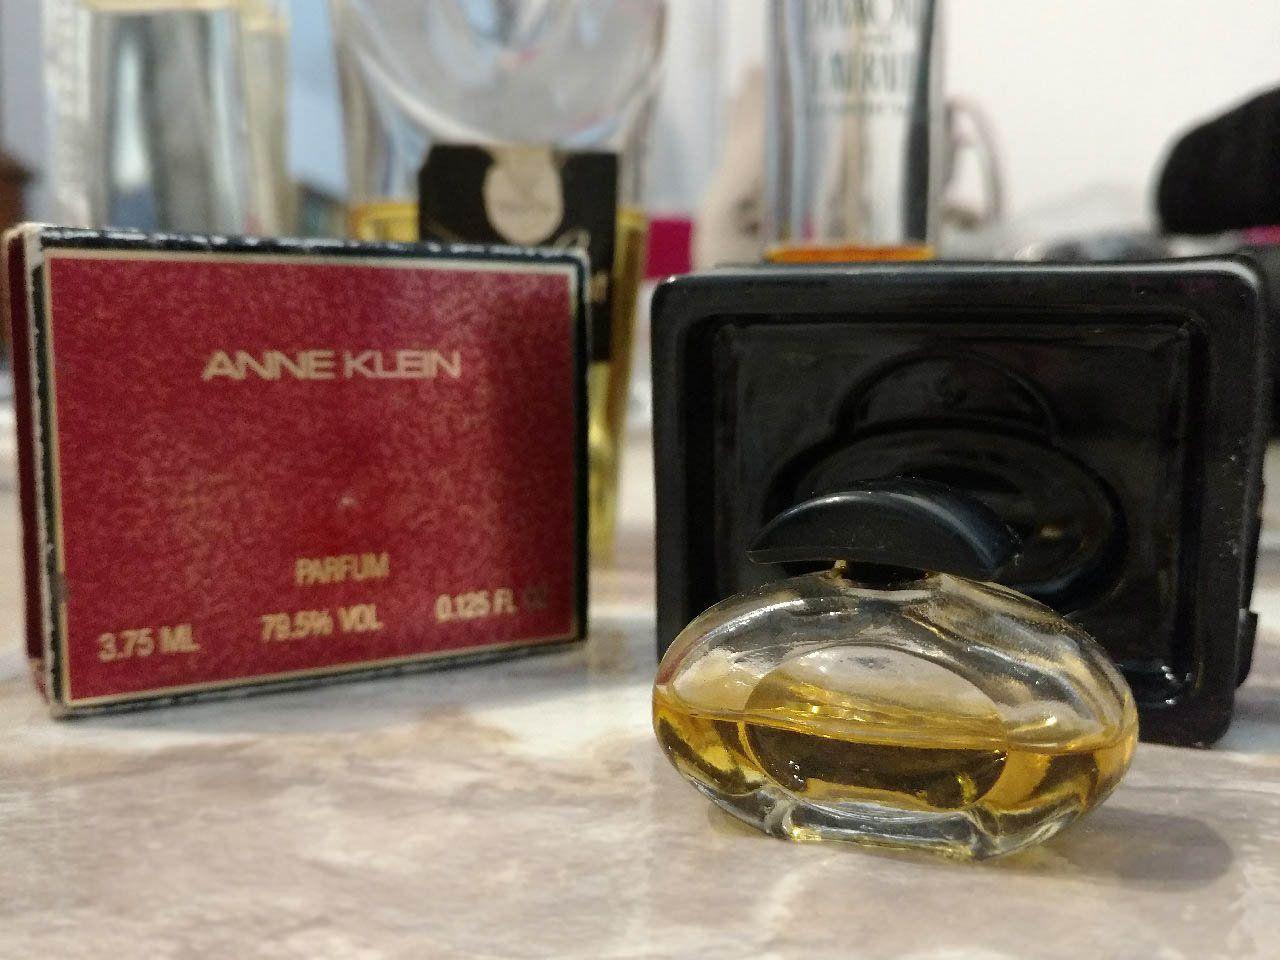 Pin on Vintage Perfume & Cologne